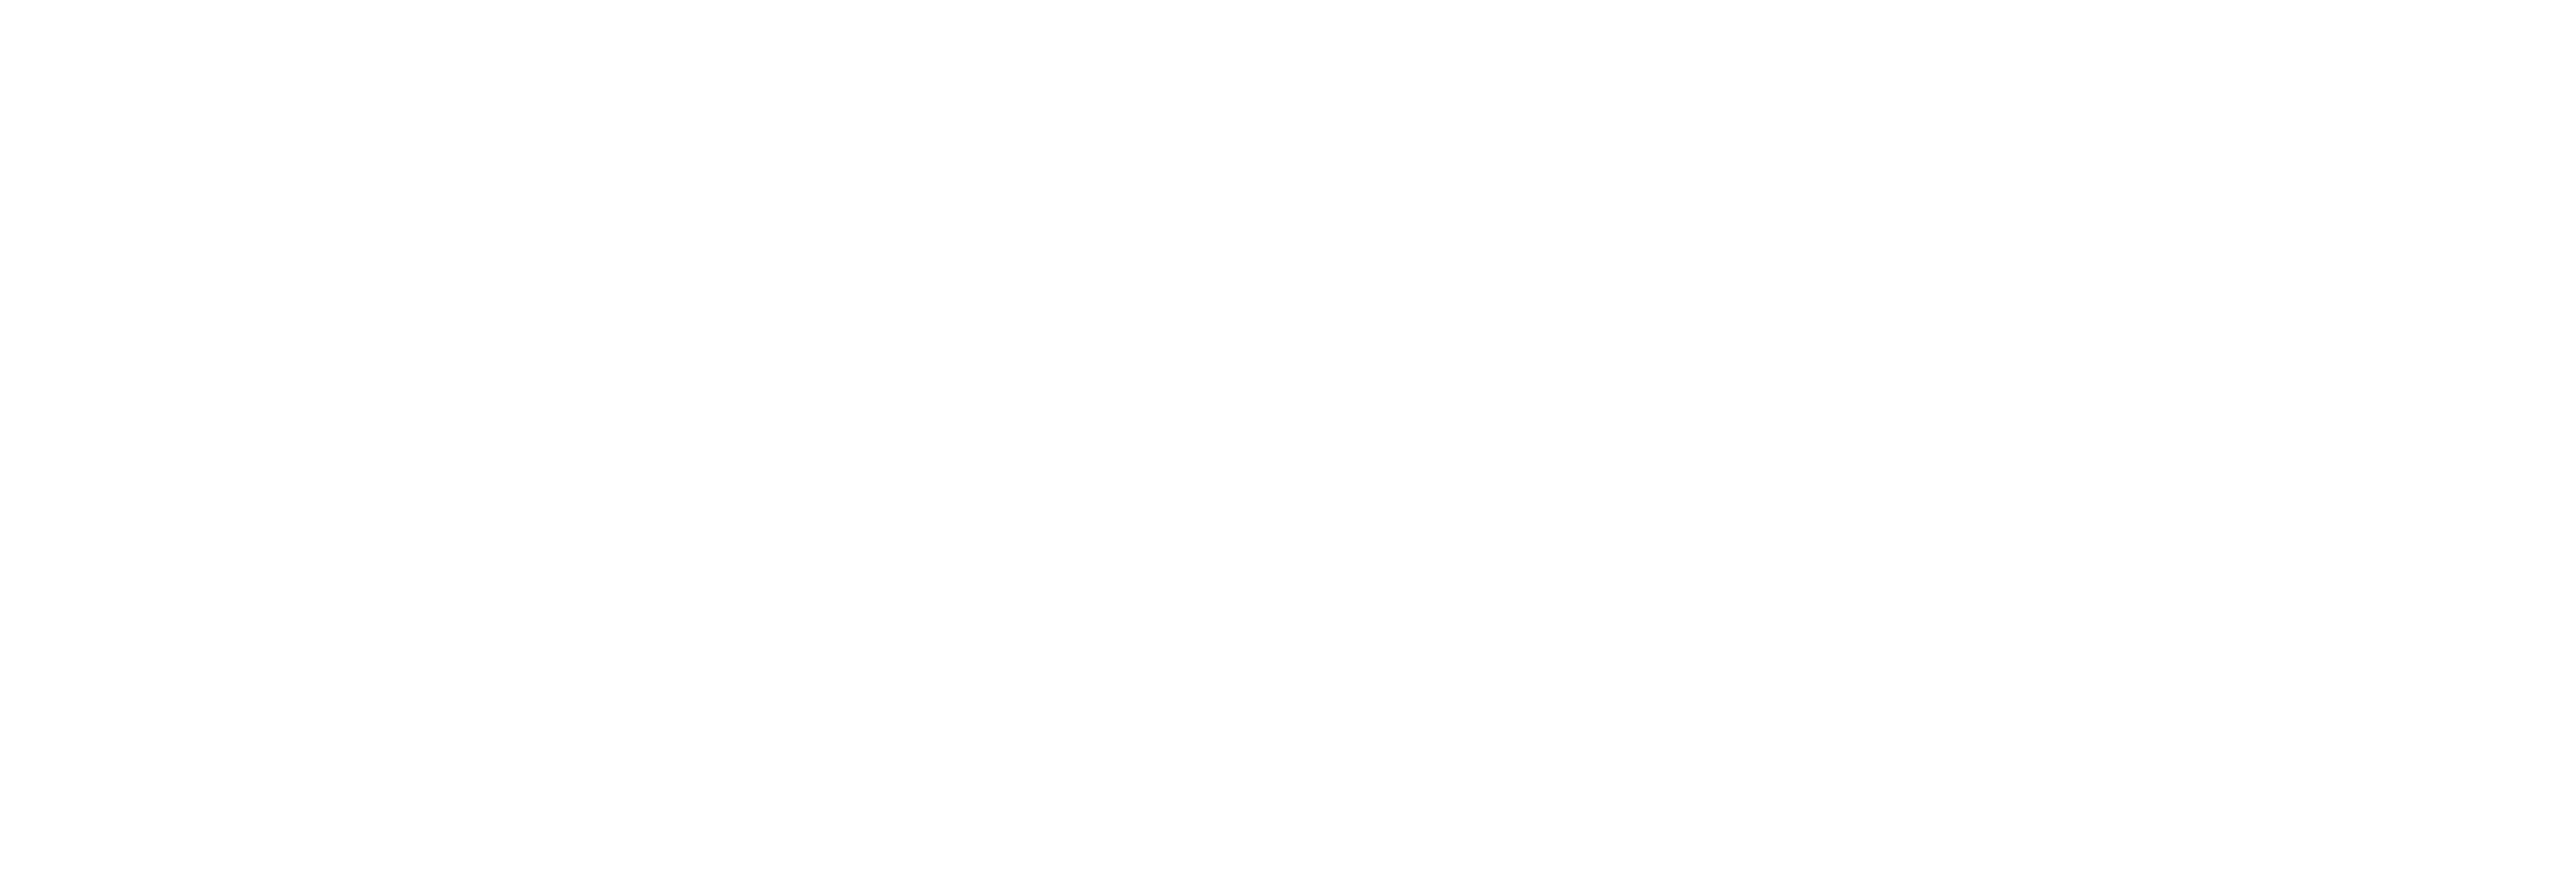 City of Bloomington, IN - Zoom Logo